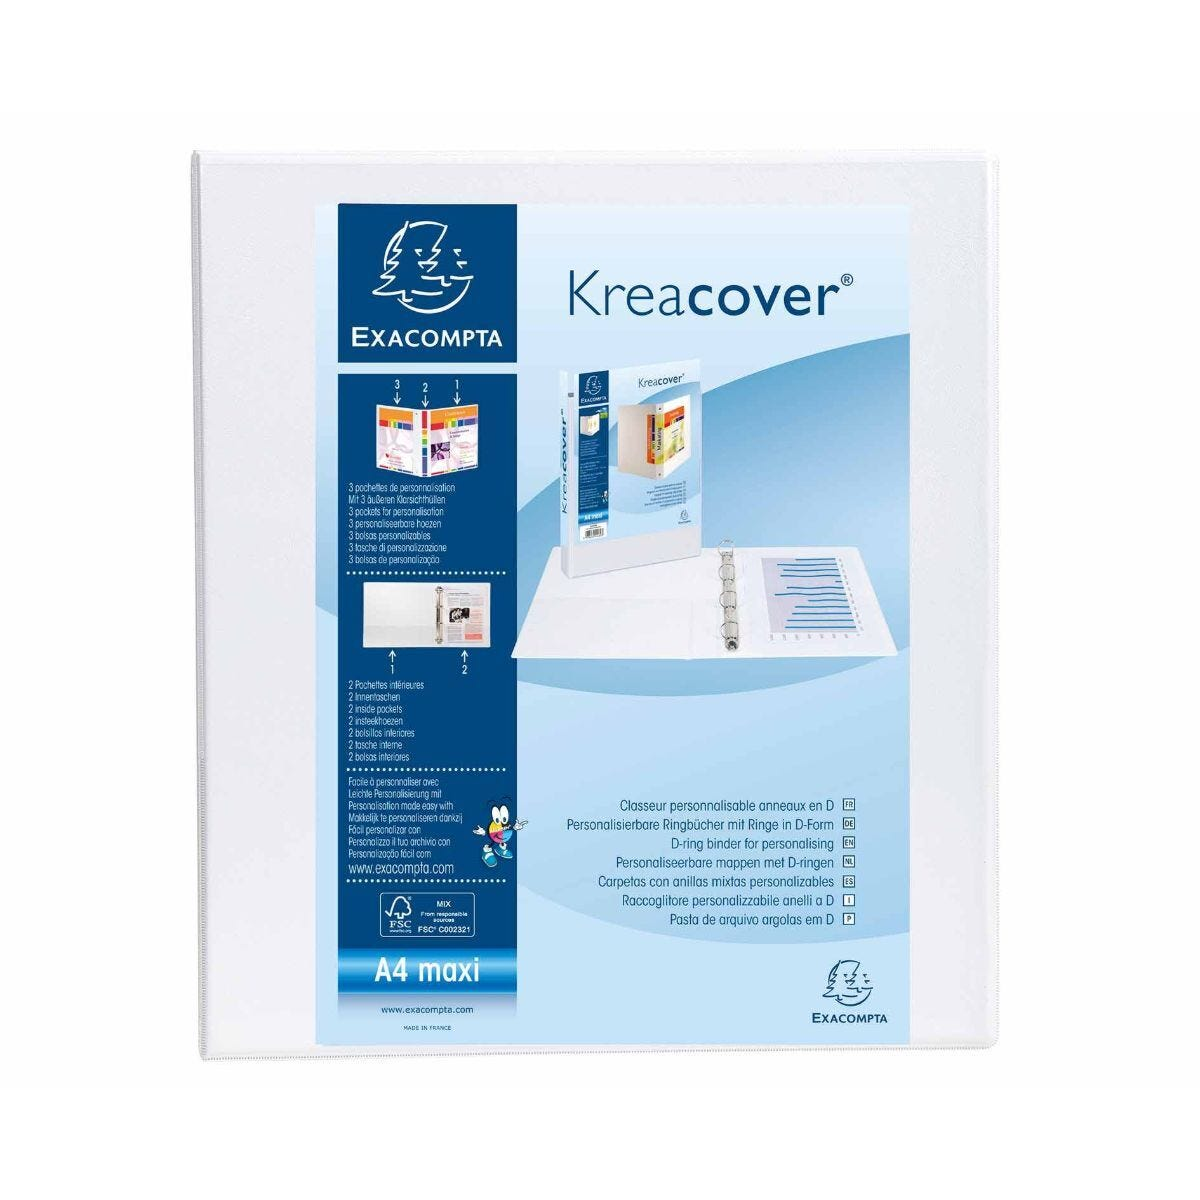 Exacompta Kreacover Ring Binder 4 D Rings 40mm A4 Plus Pack of 10 White